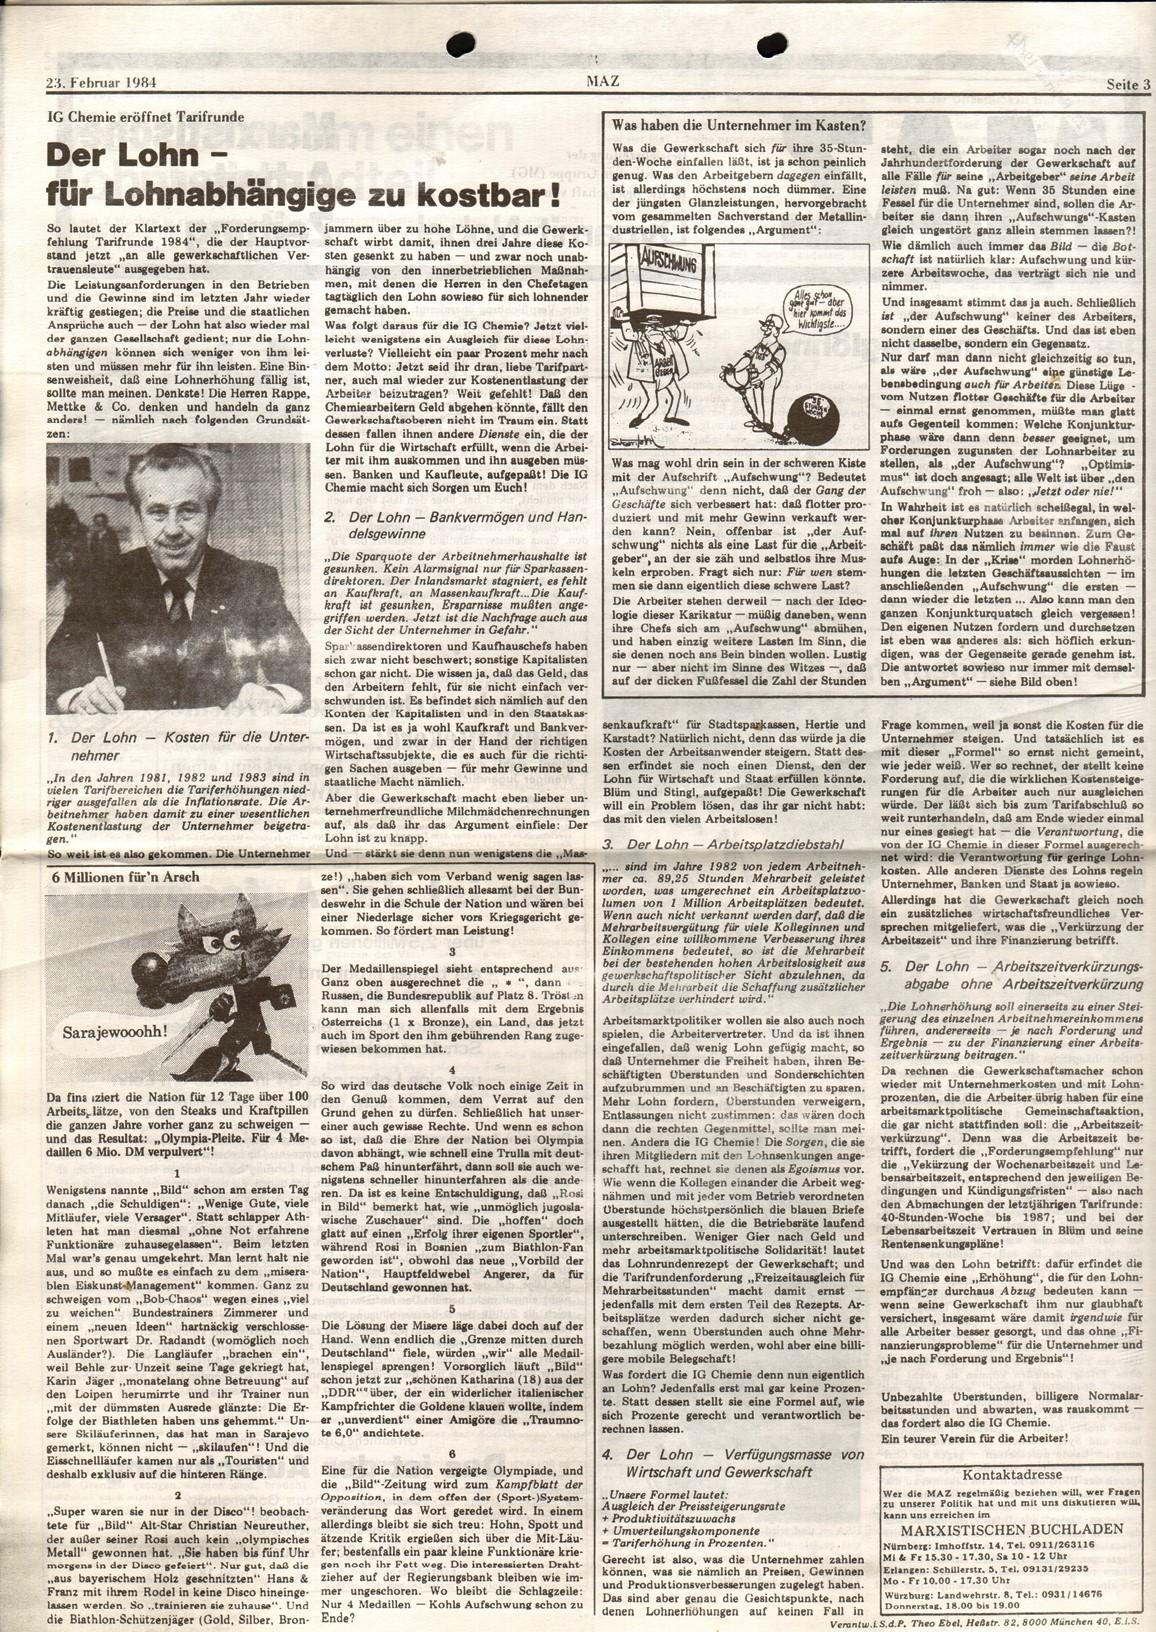 Fuerth_MG_MAZ_Dynamit_Nobel_19840223_03